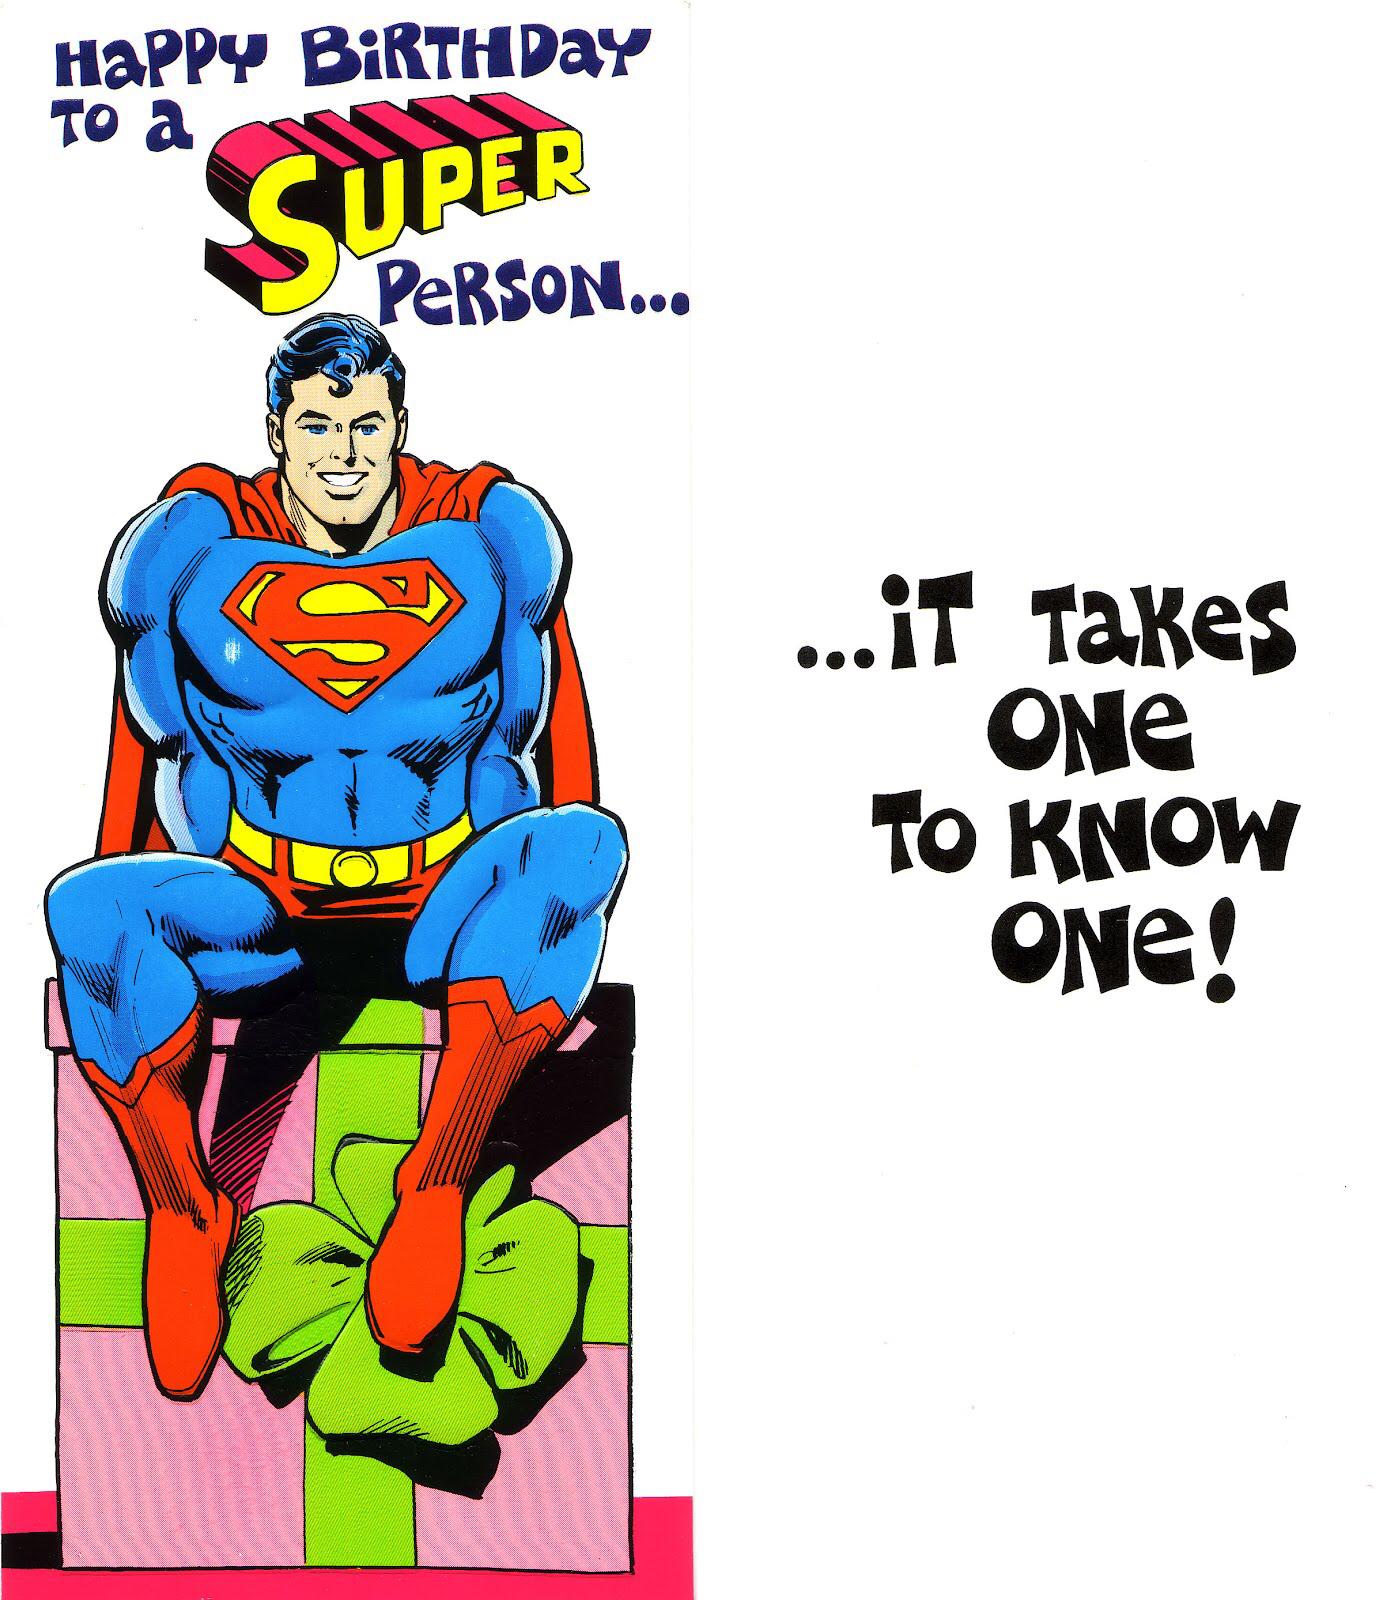 Superman clipart happy birthday Com/p/2016/07/funny and Birthday birthday by